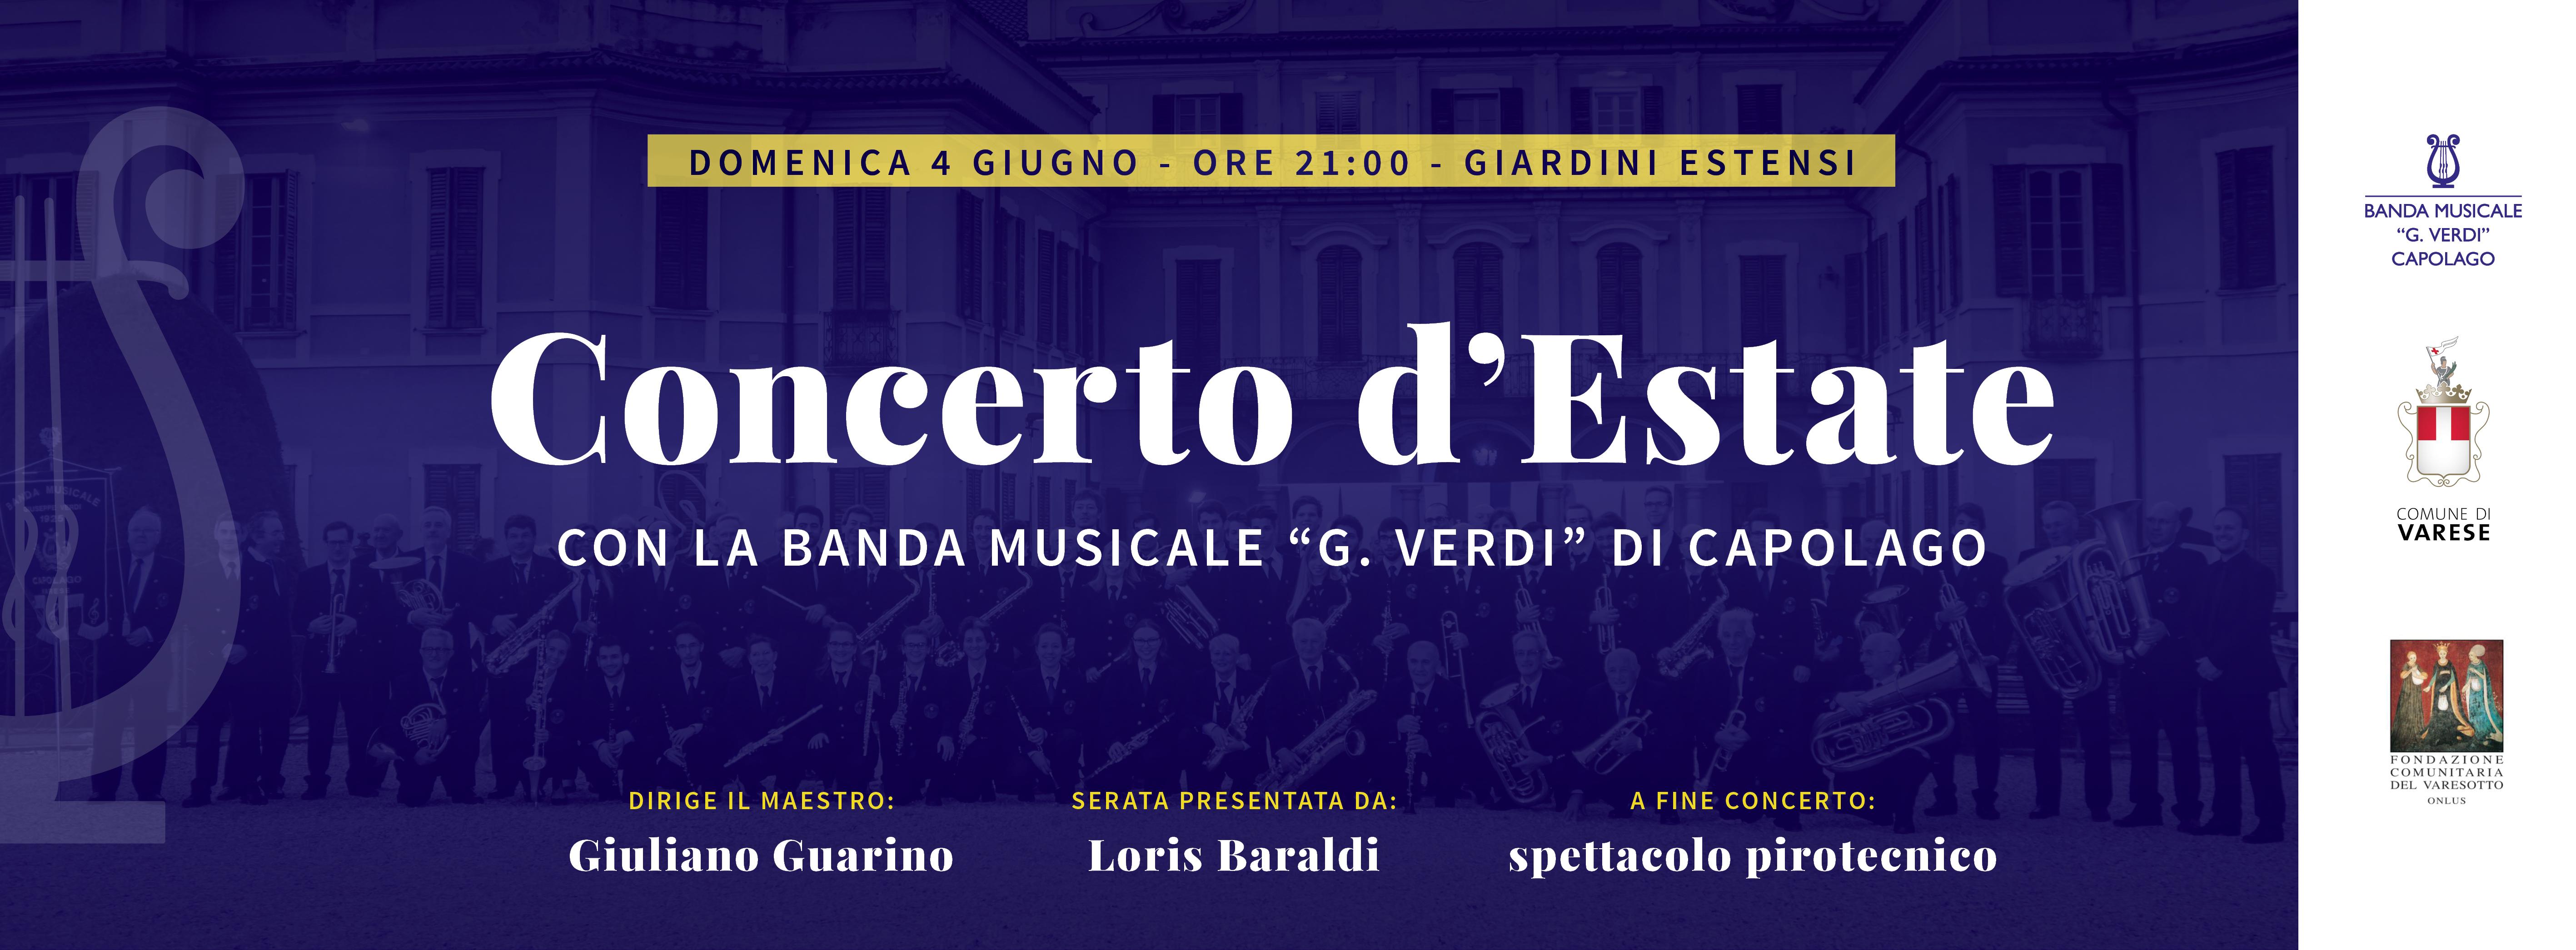 CONCERTO D'ESTATE 2017 - COPERTINA FB